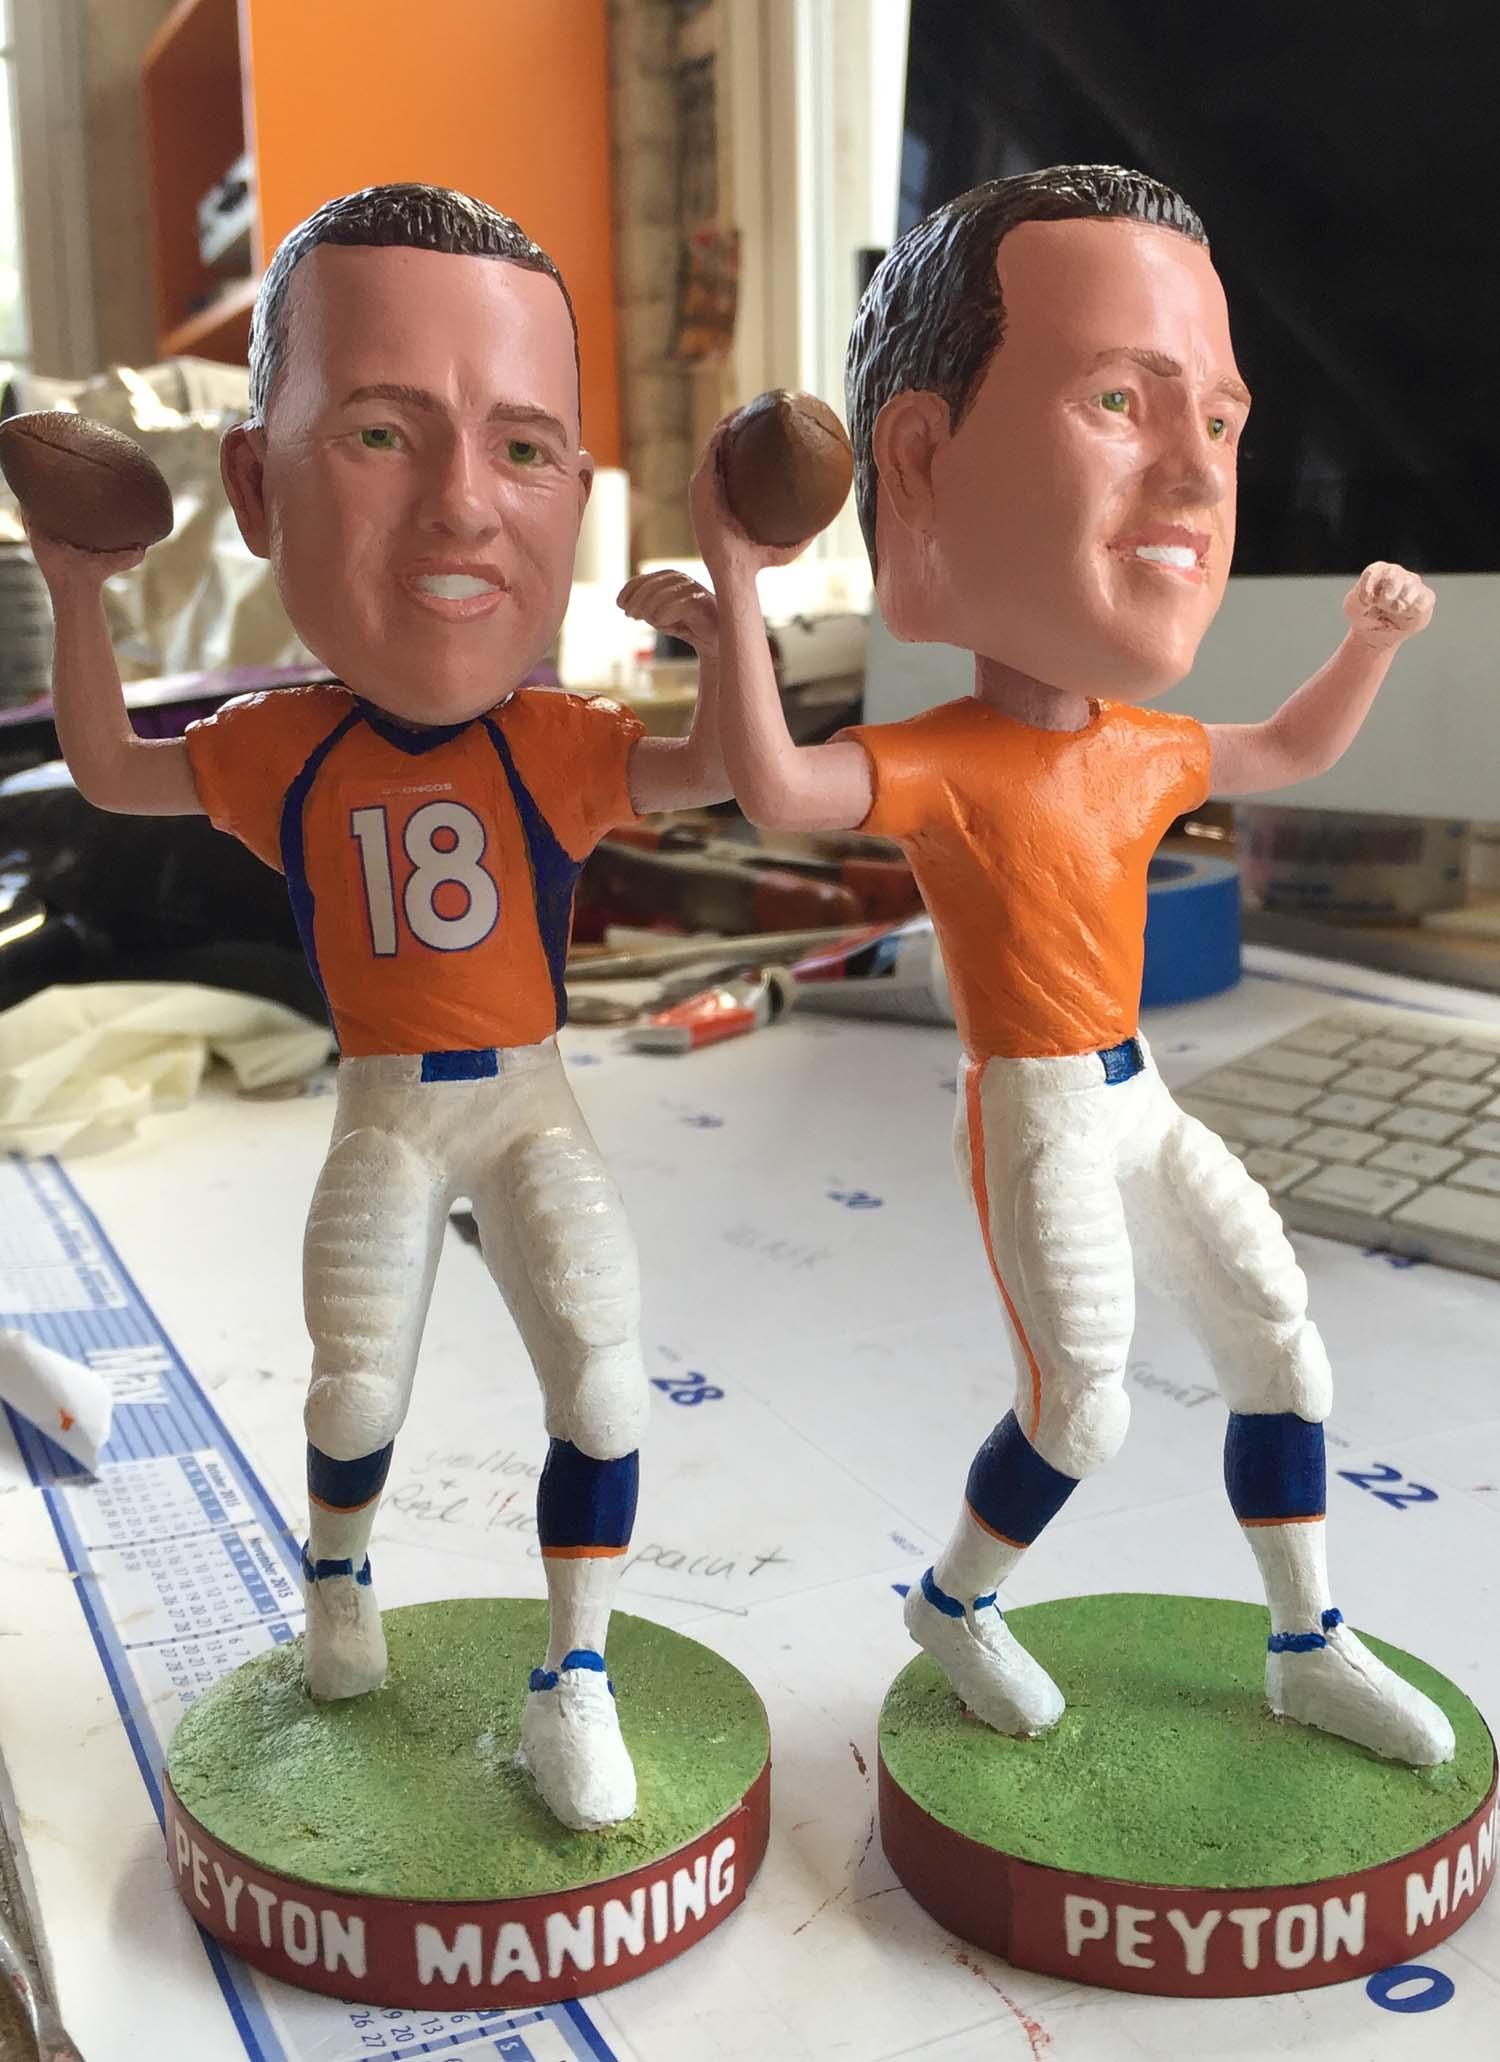 Peyton Manning bobble head